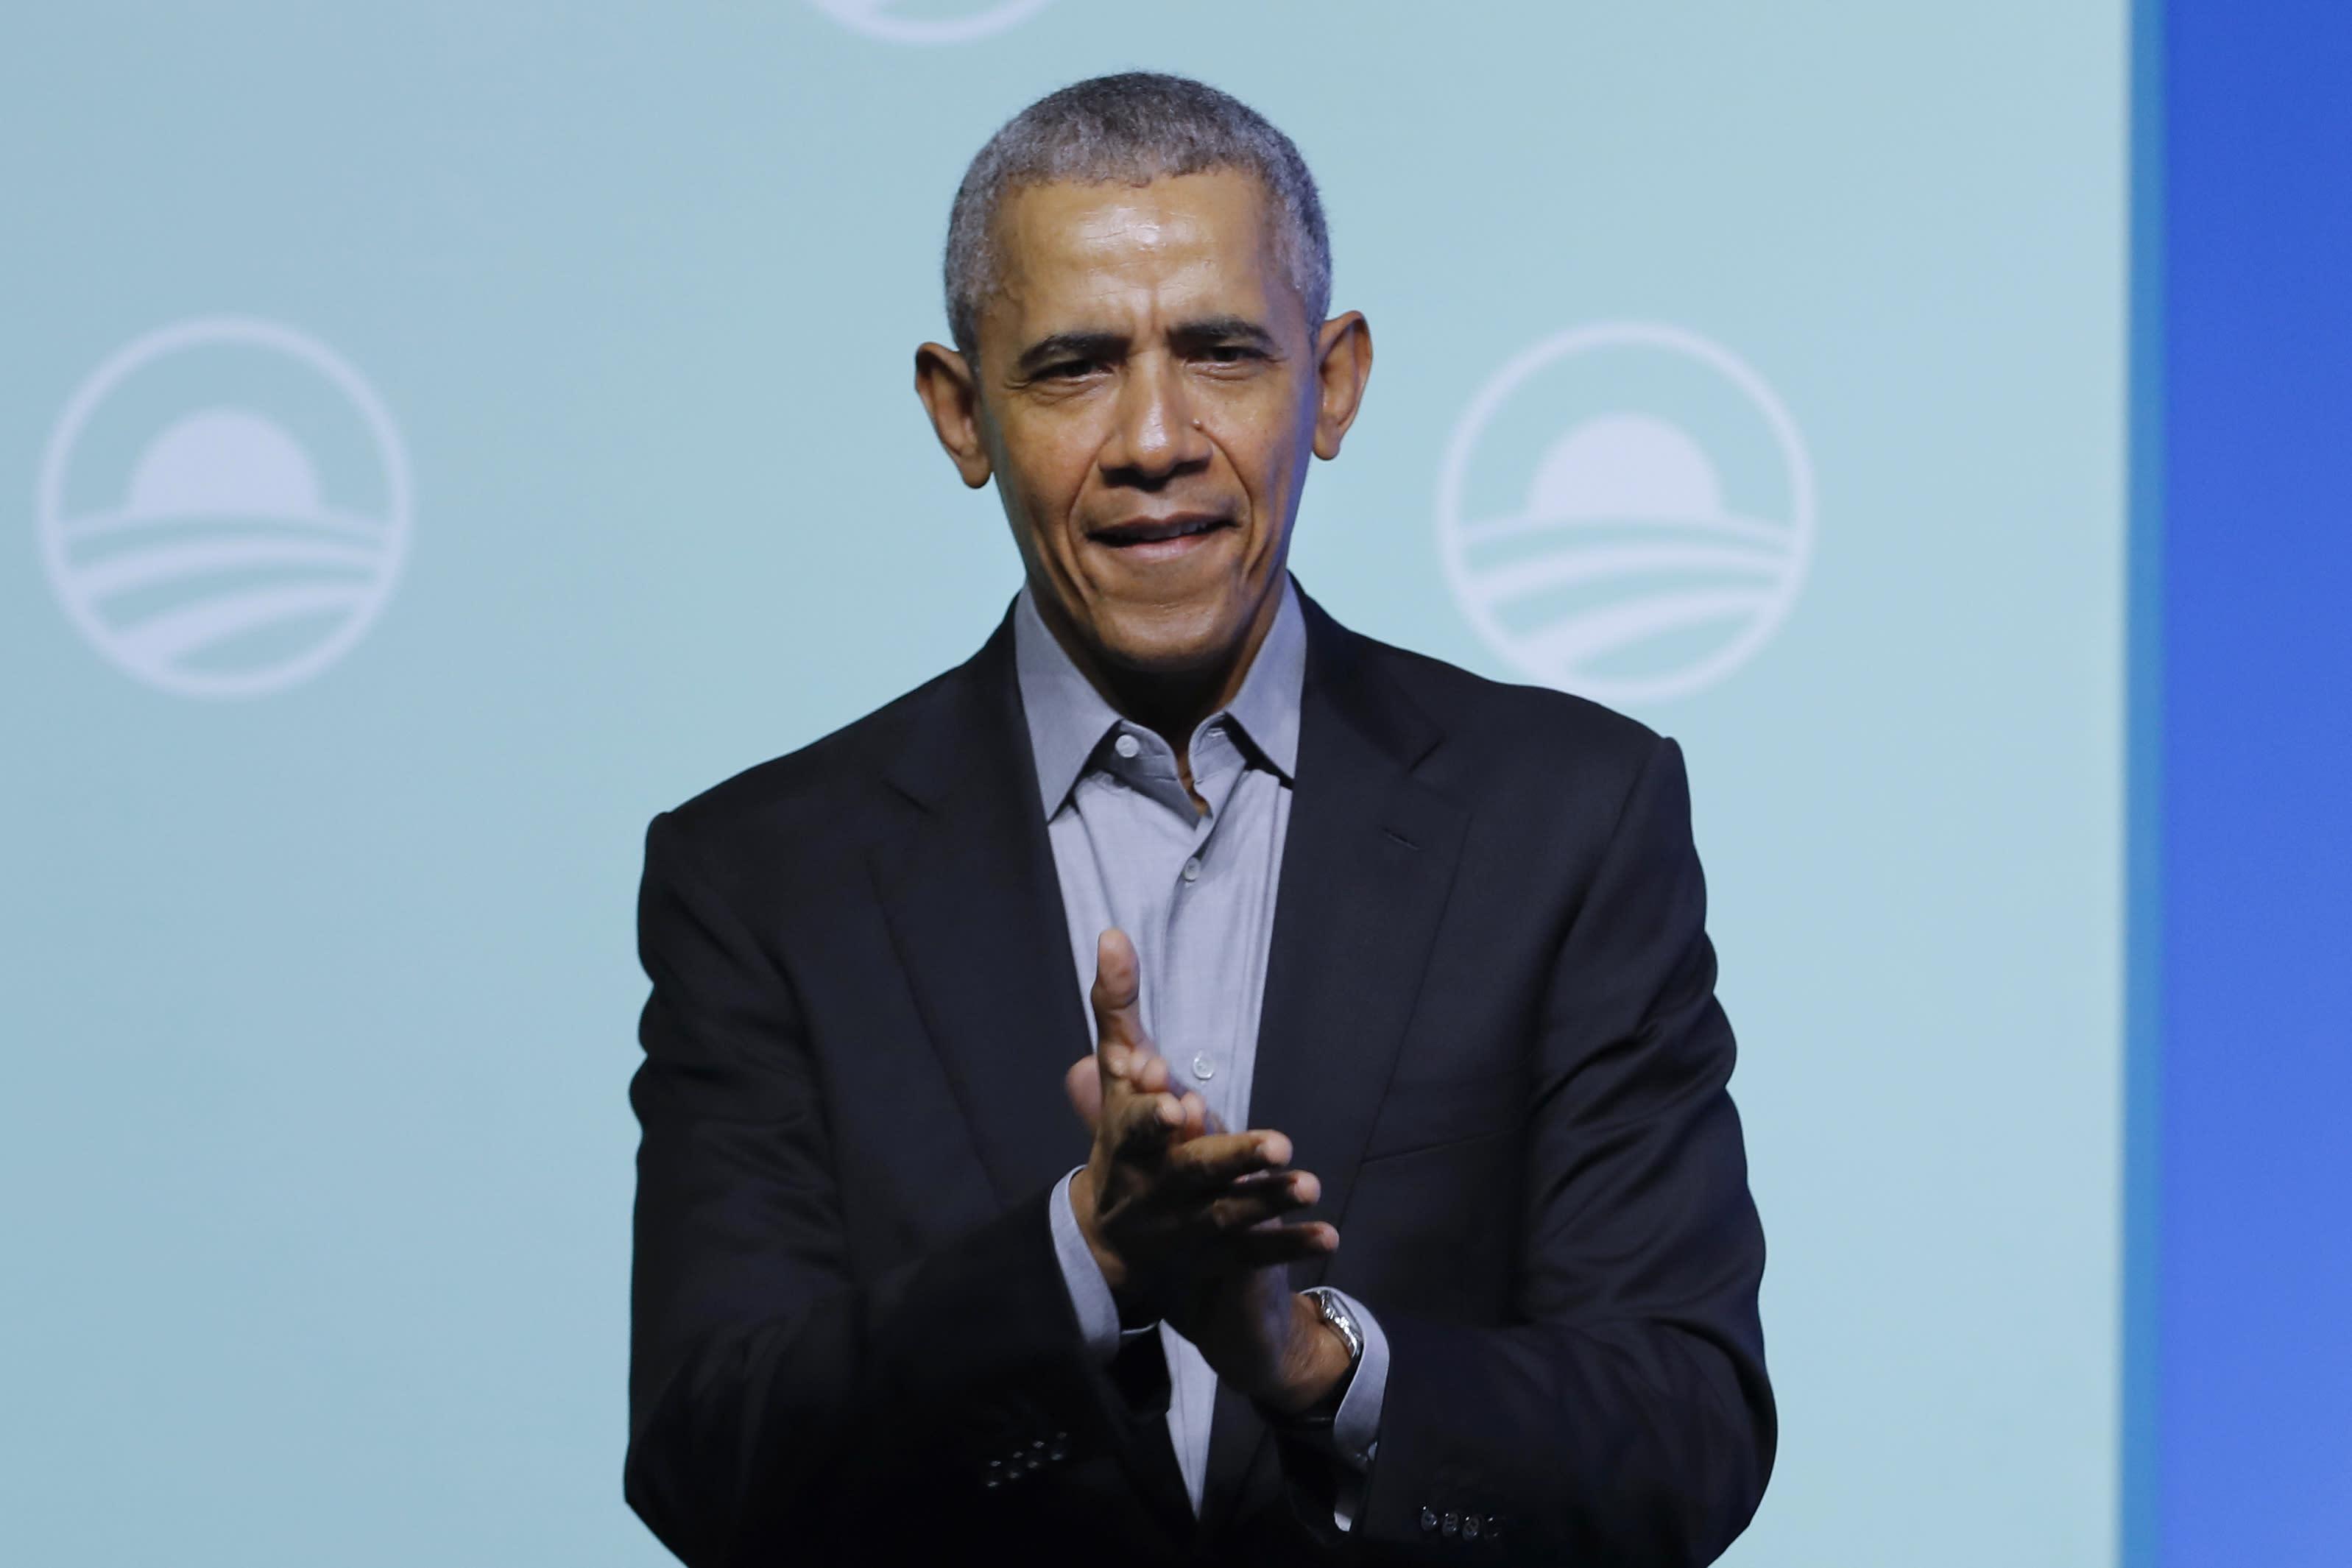 Republican Attorneys General push forward with lawsuit to dismantle Obamacare despite coronavirus